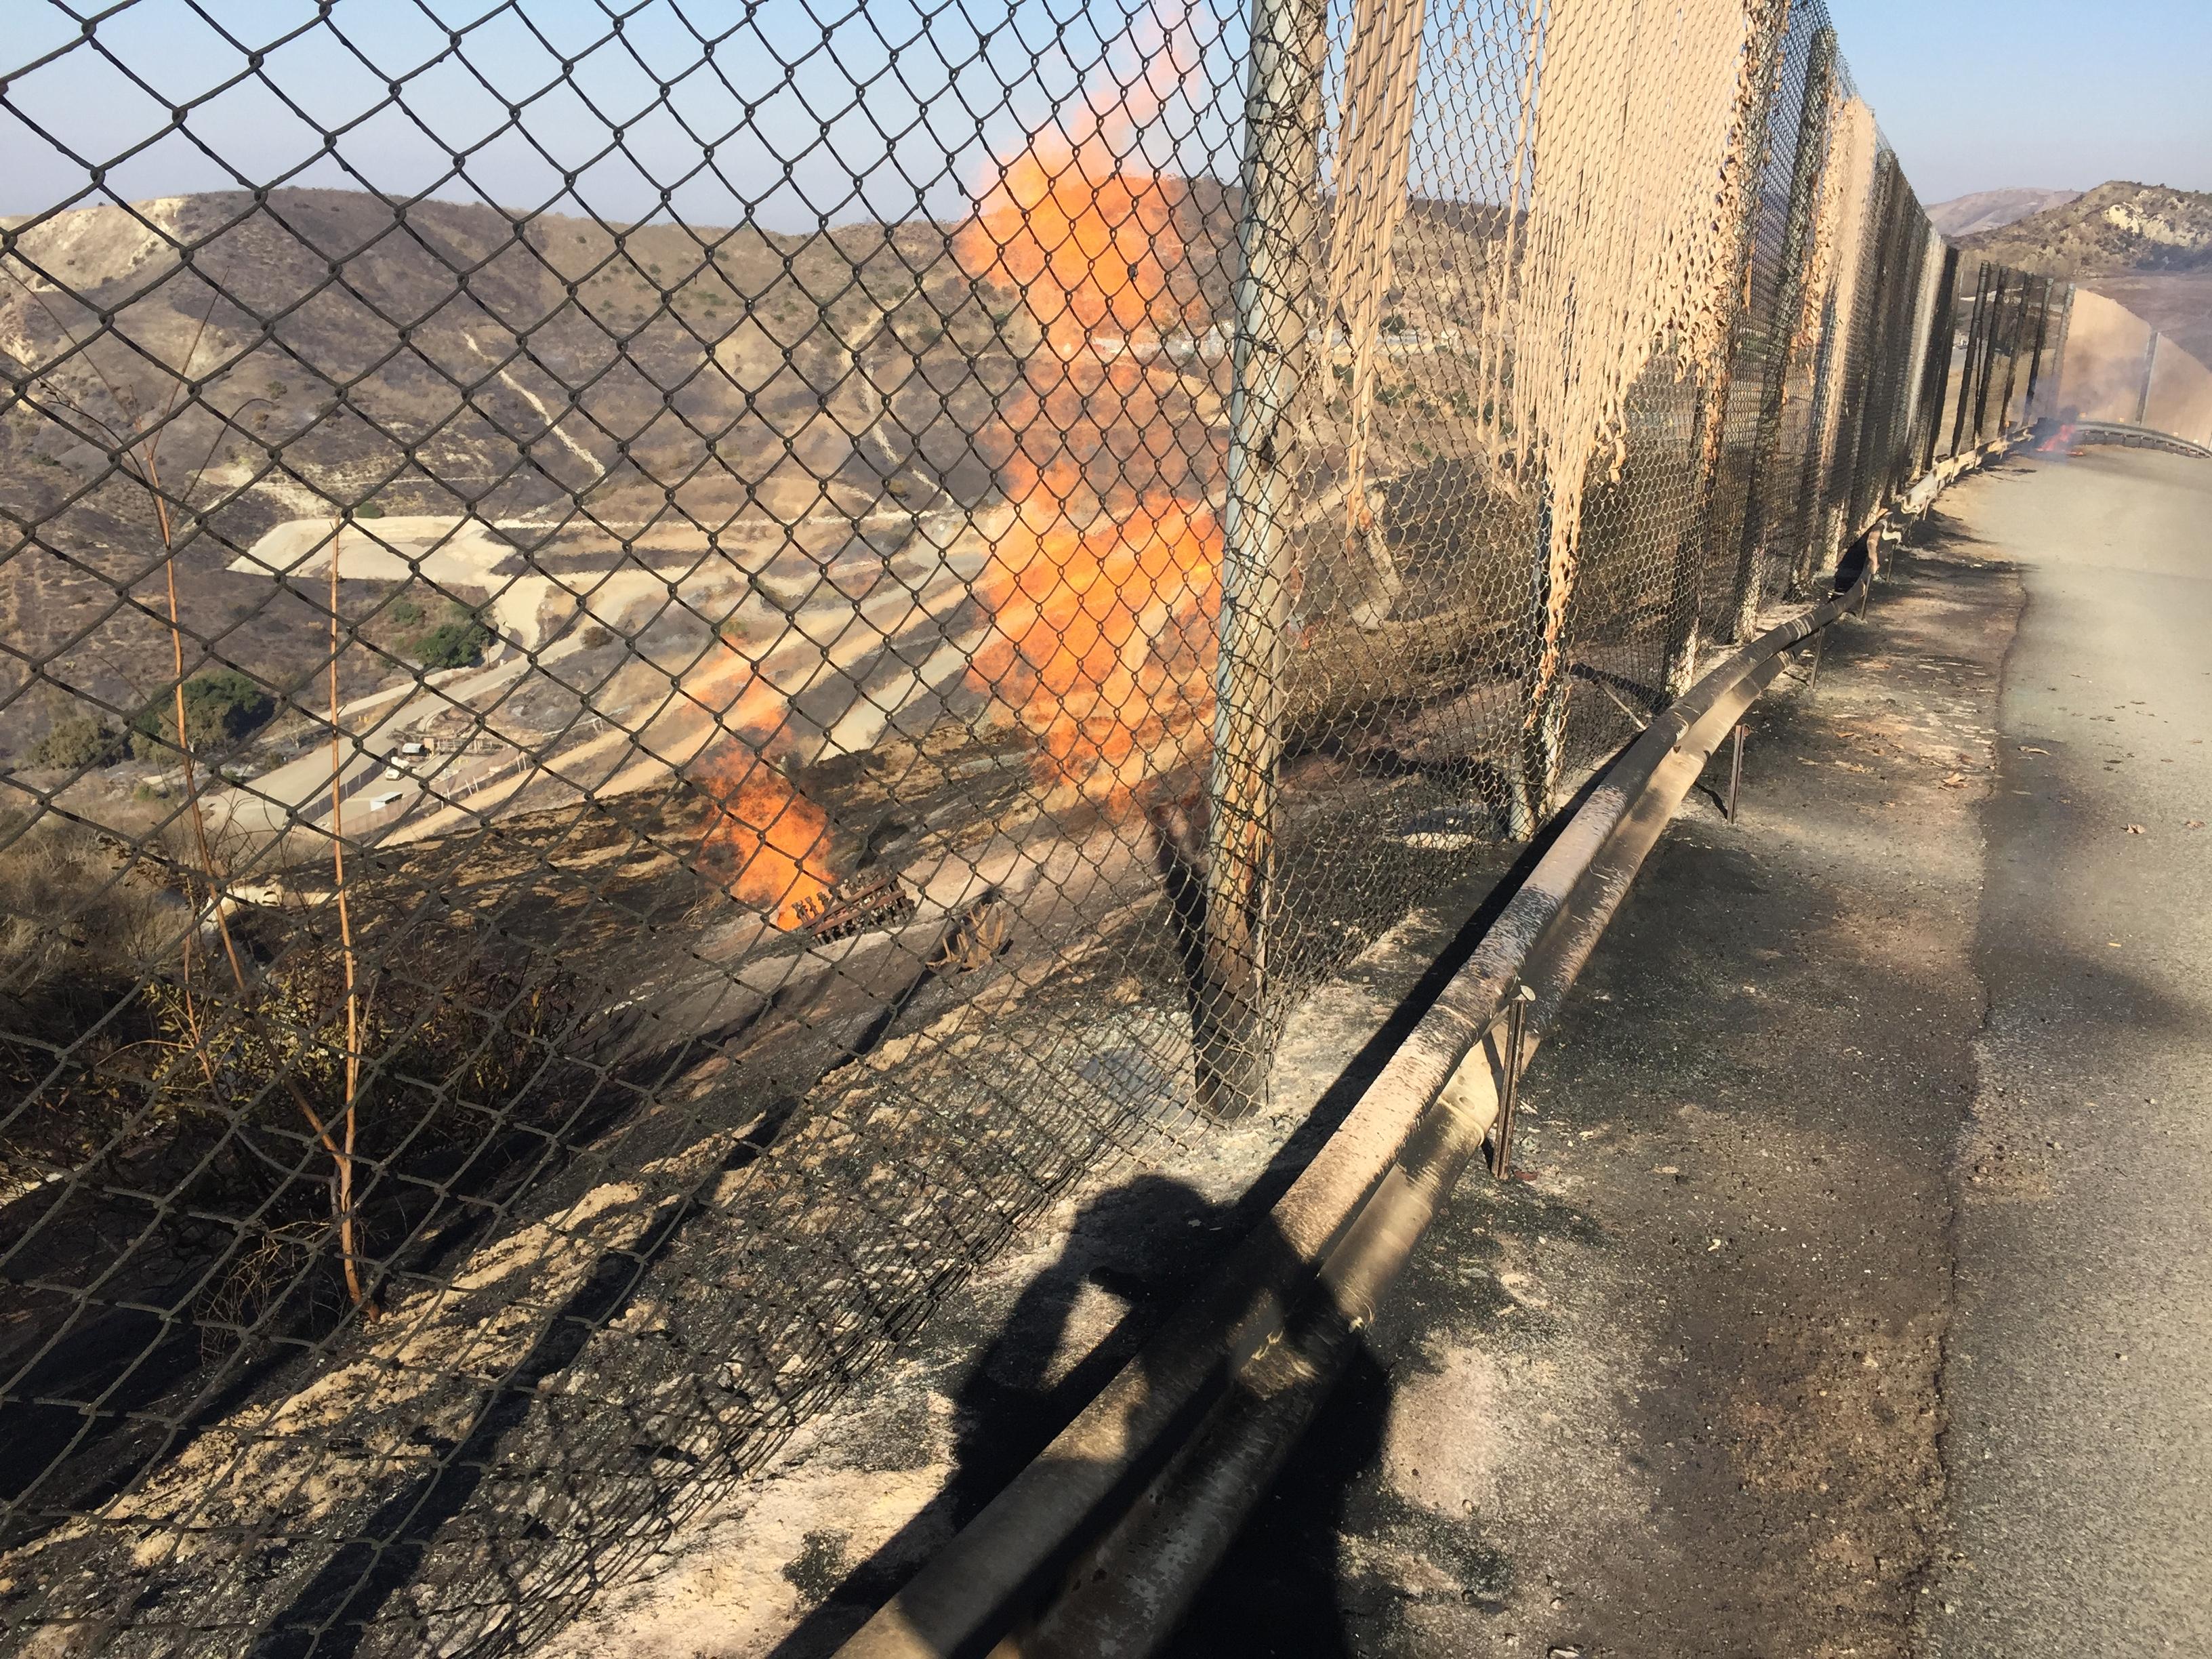 Silverado Fire at Frank R. Bowerman Landfill